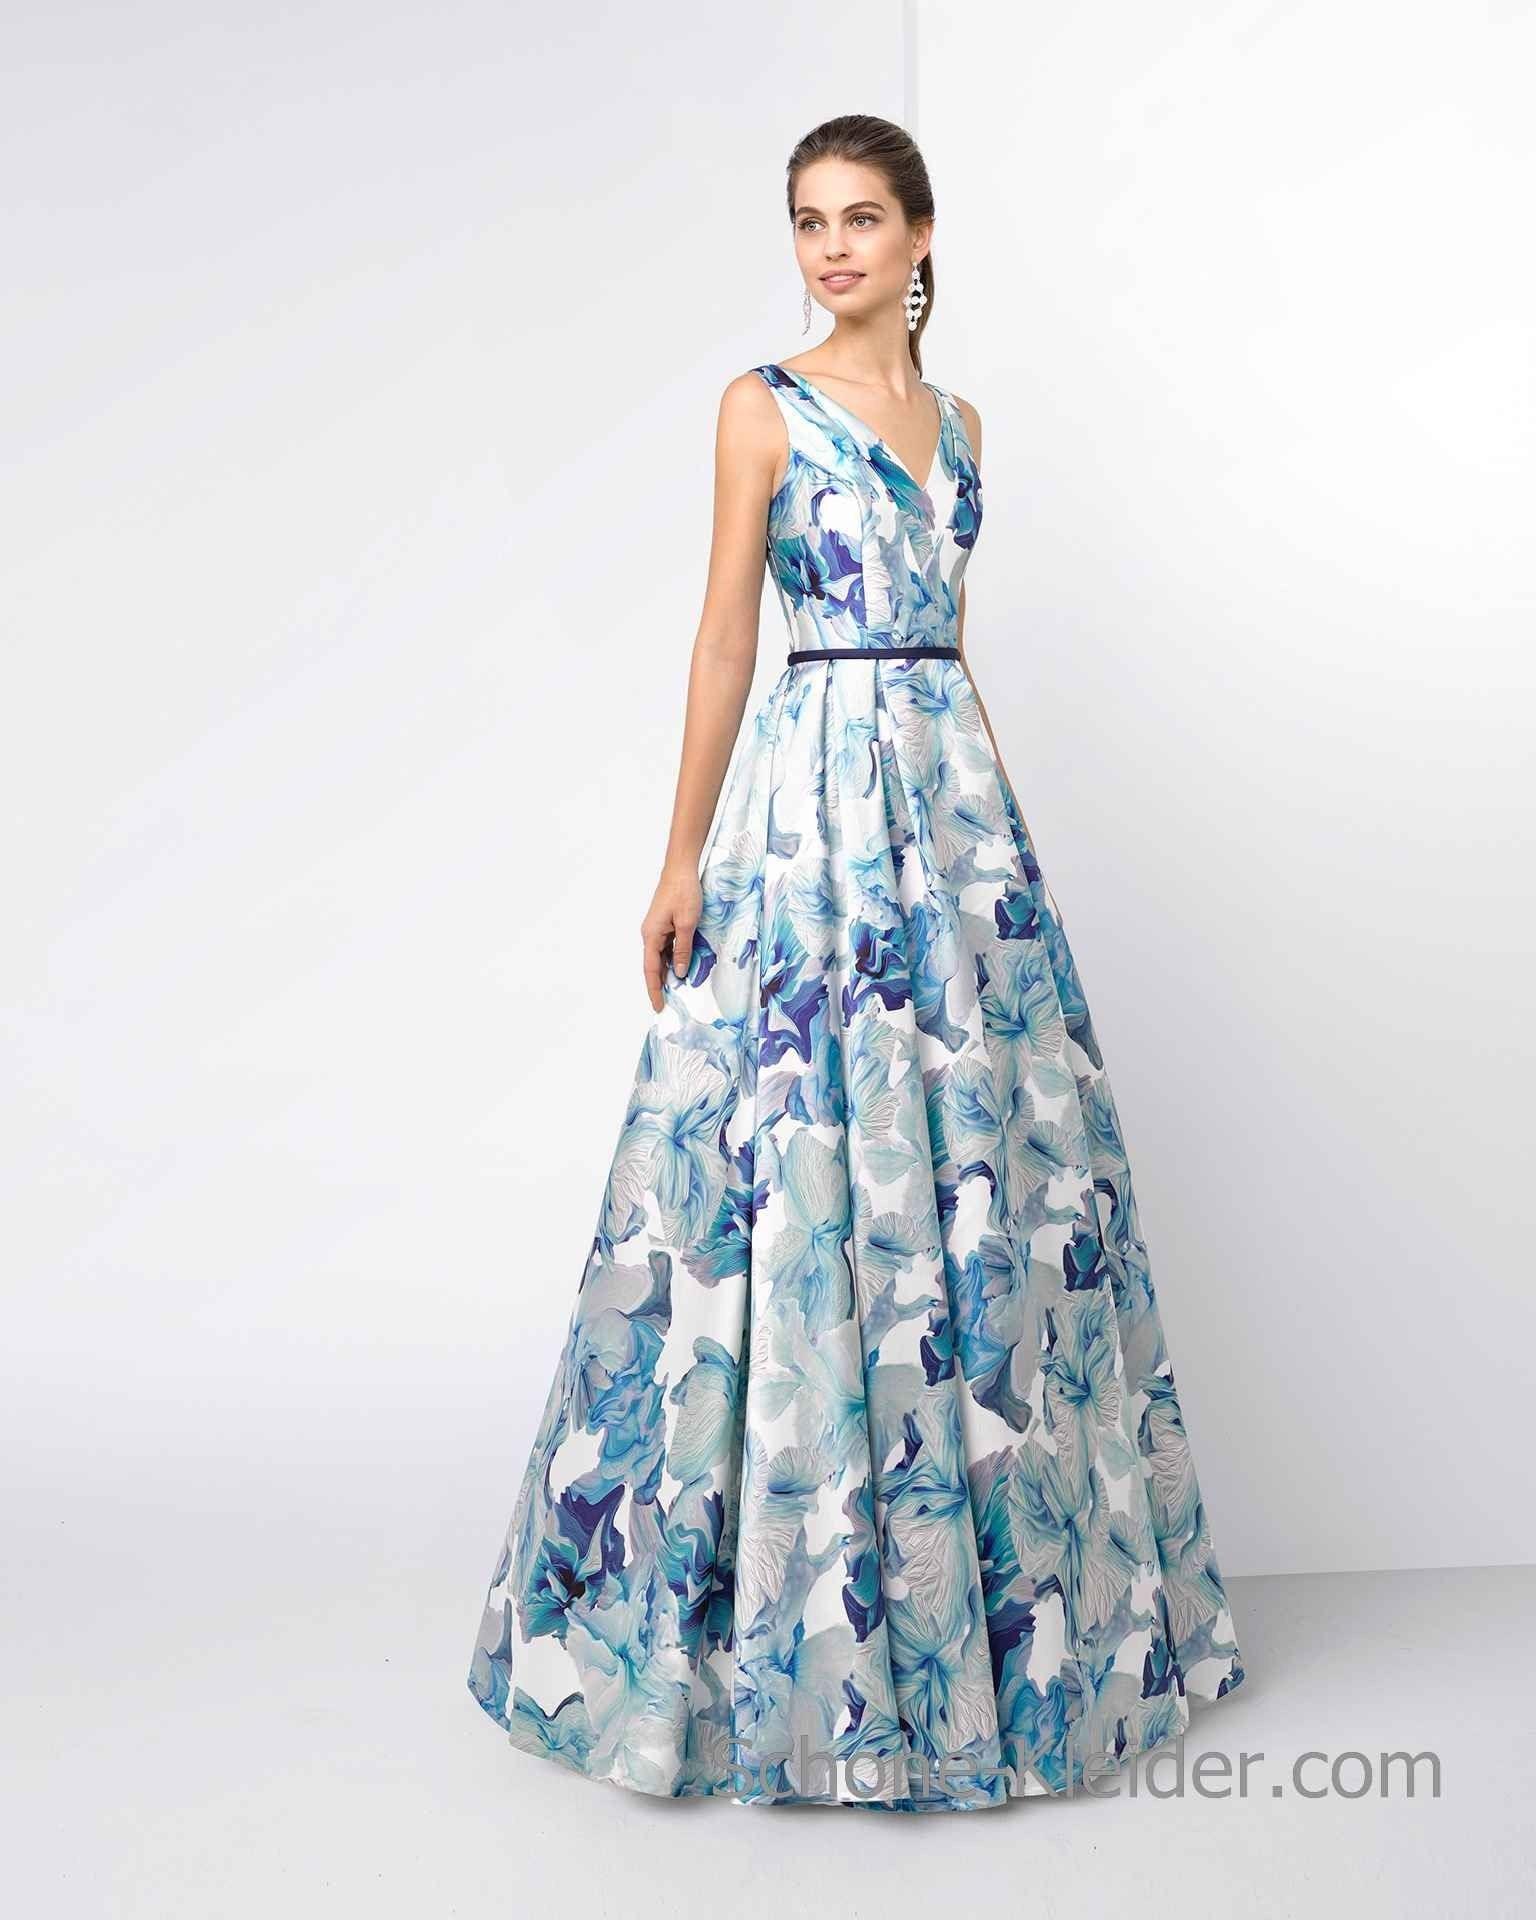 Kreativ Kleider Anlass Stylish13 Spektakulär Kleider Anlass Galerie